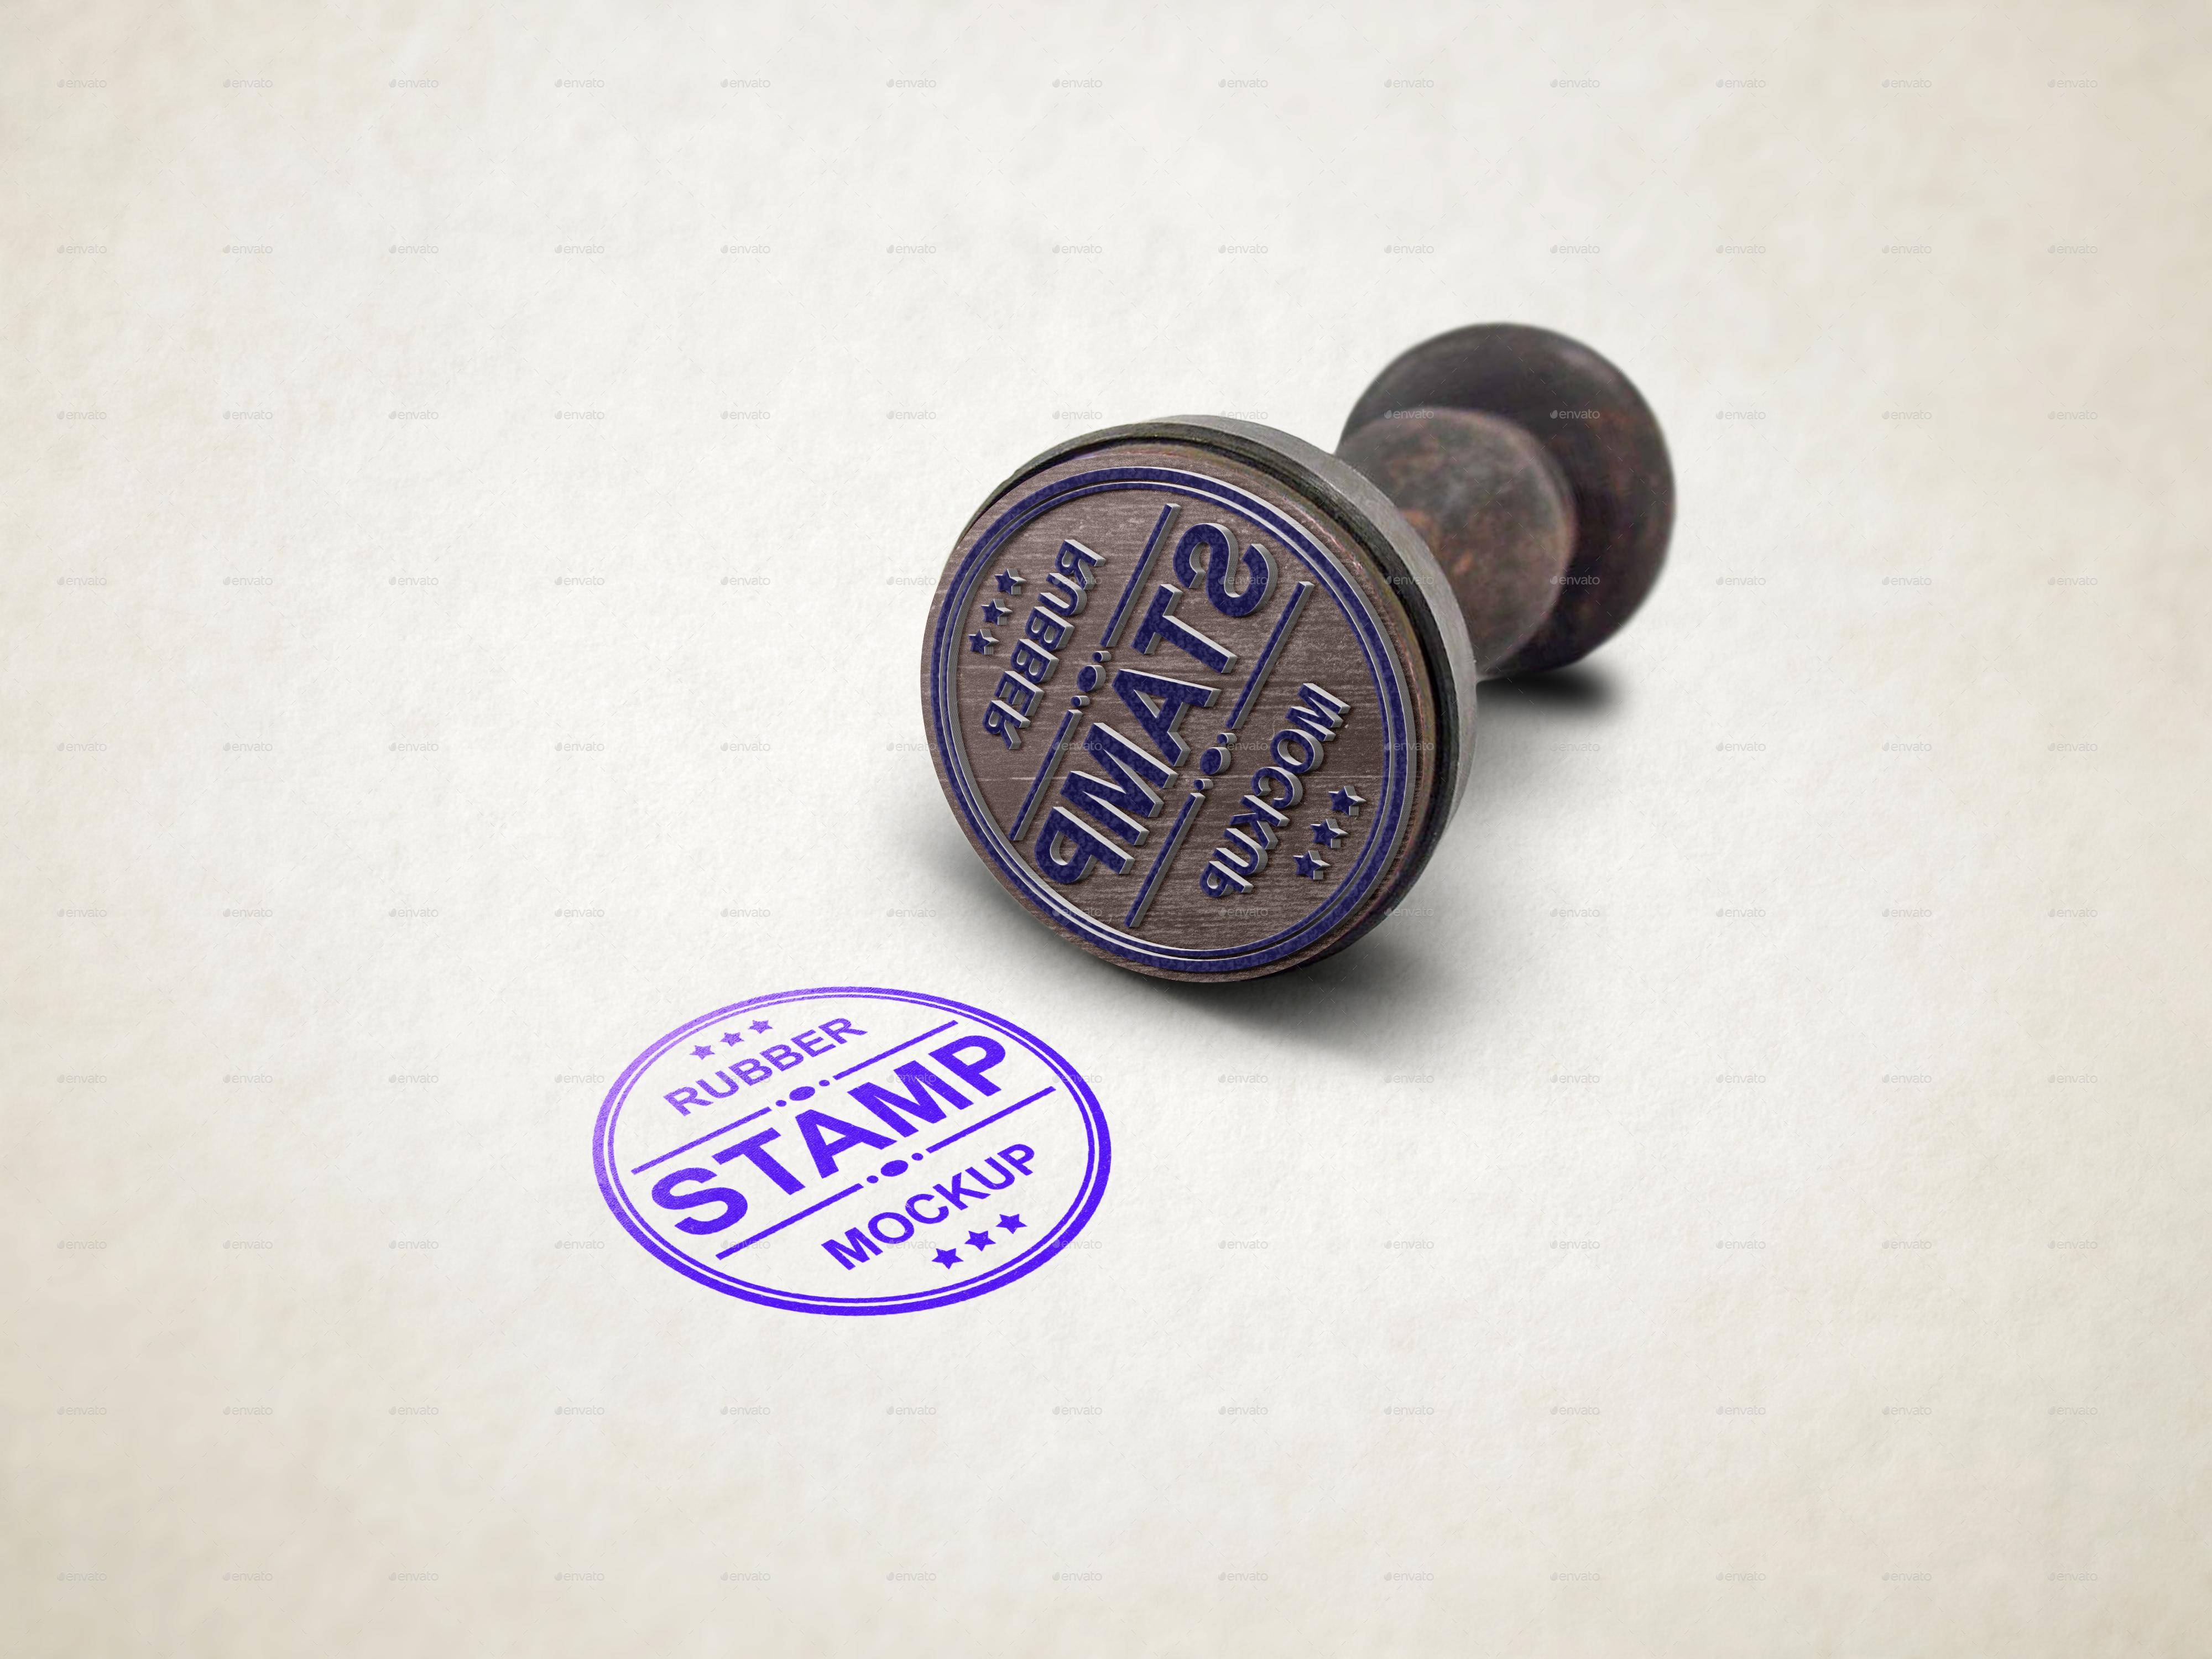 Graphicriver logo mockup v 5 for Rubber stamp t shirt printing